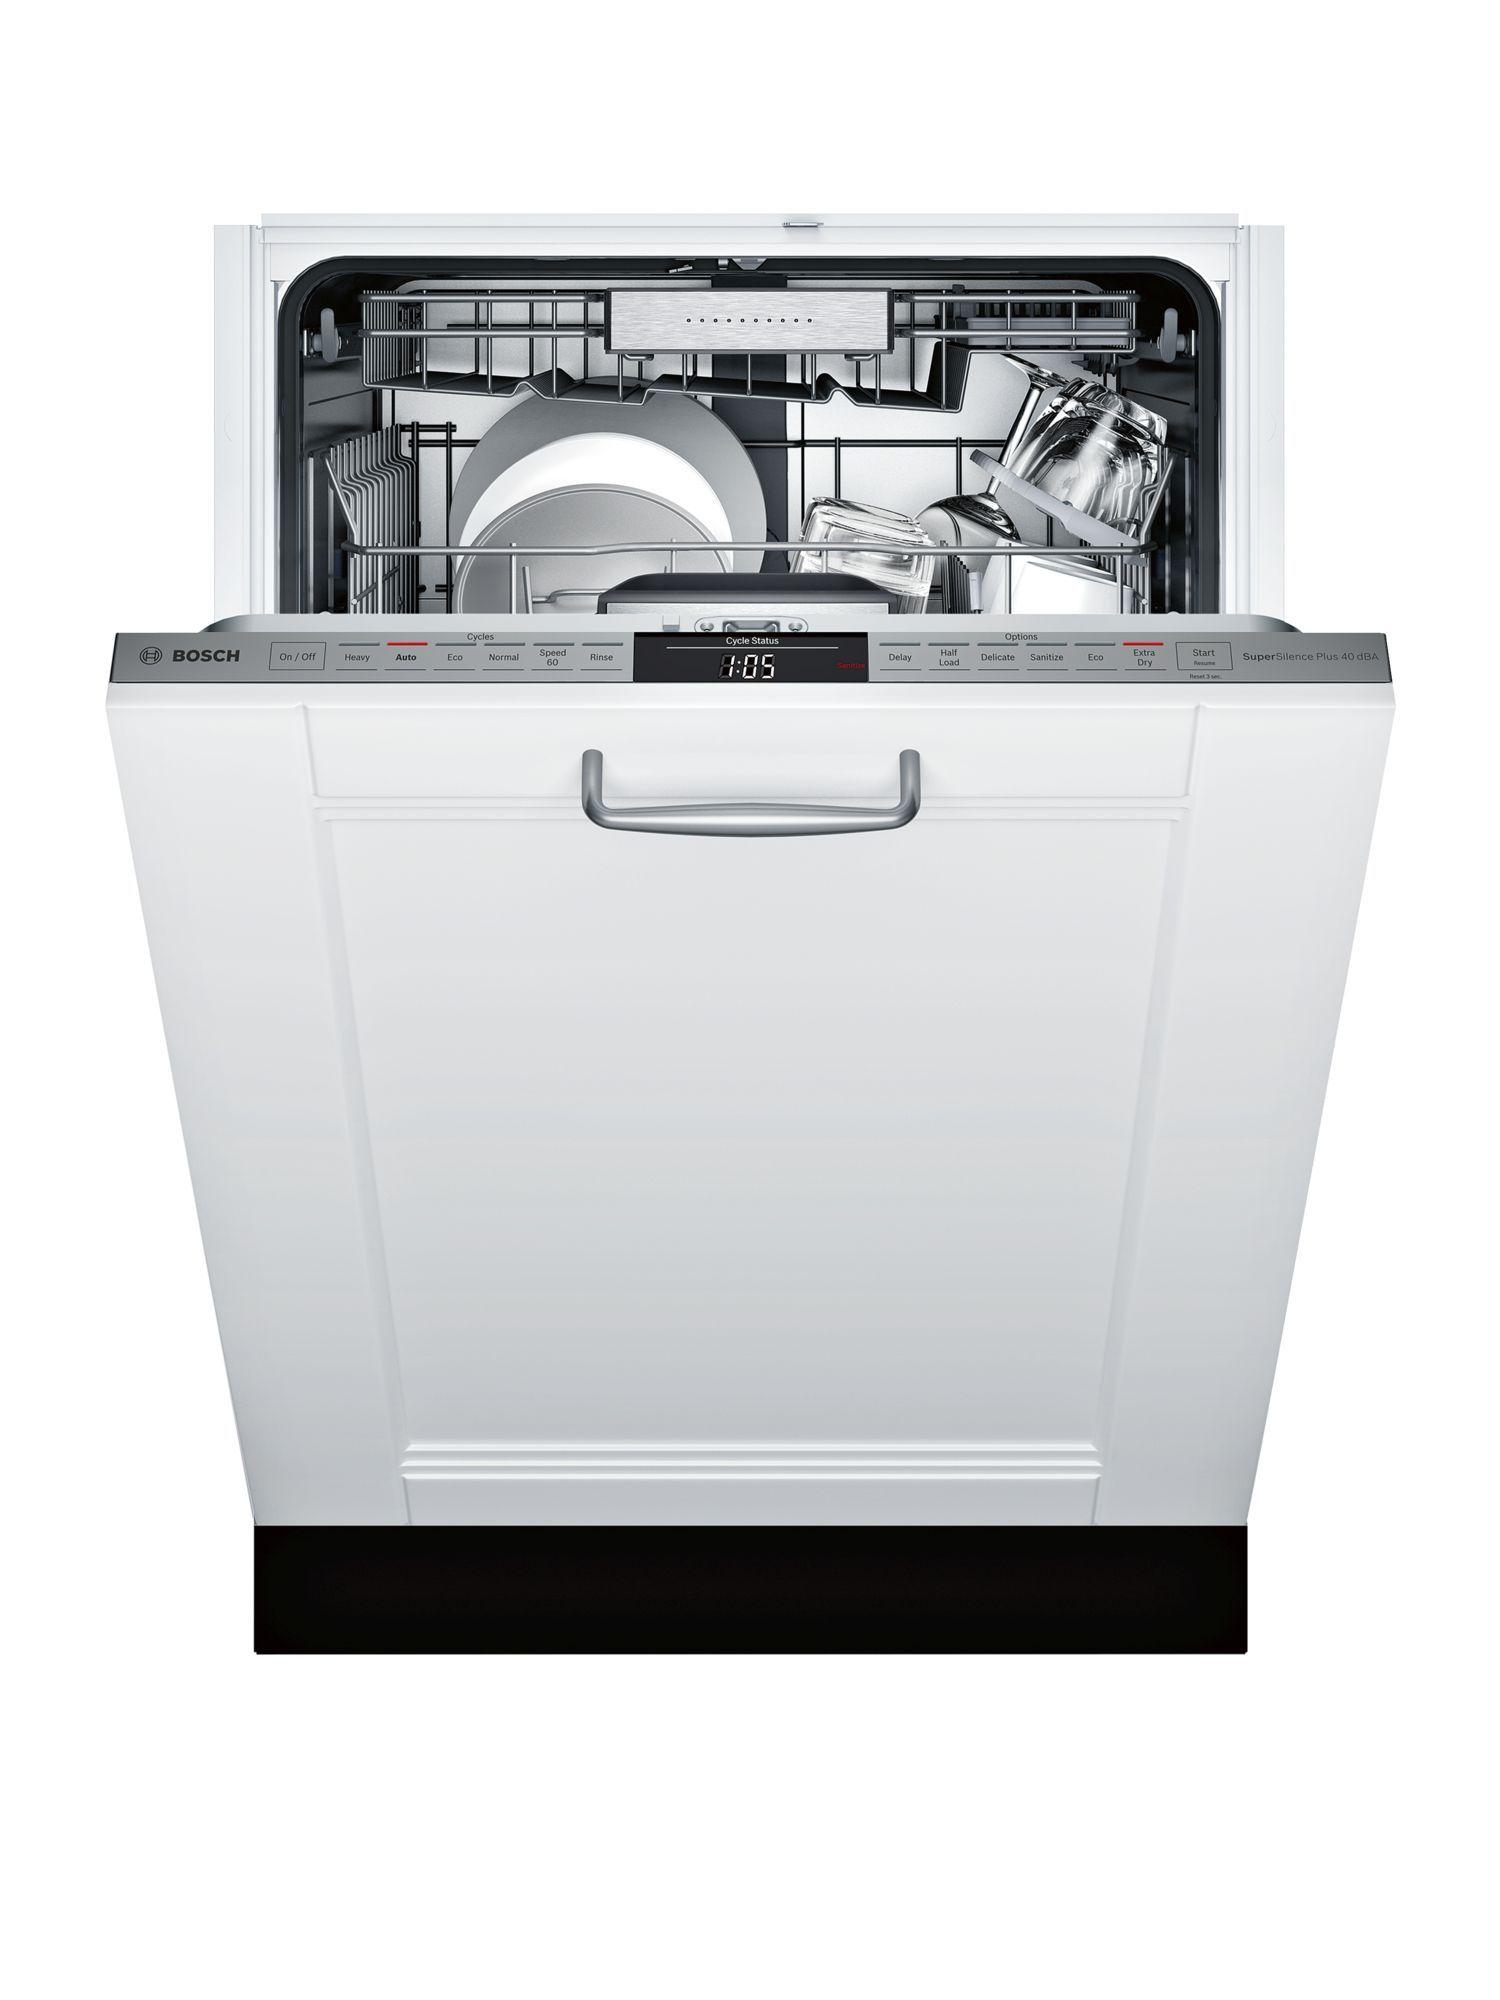 Bosch Shvm98w73n Dishwasher Large Utensils Dishwasher Black Dishwasher